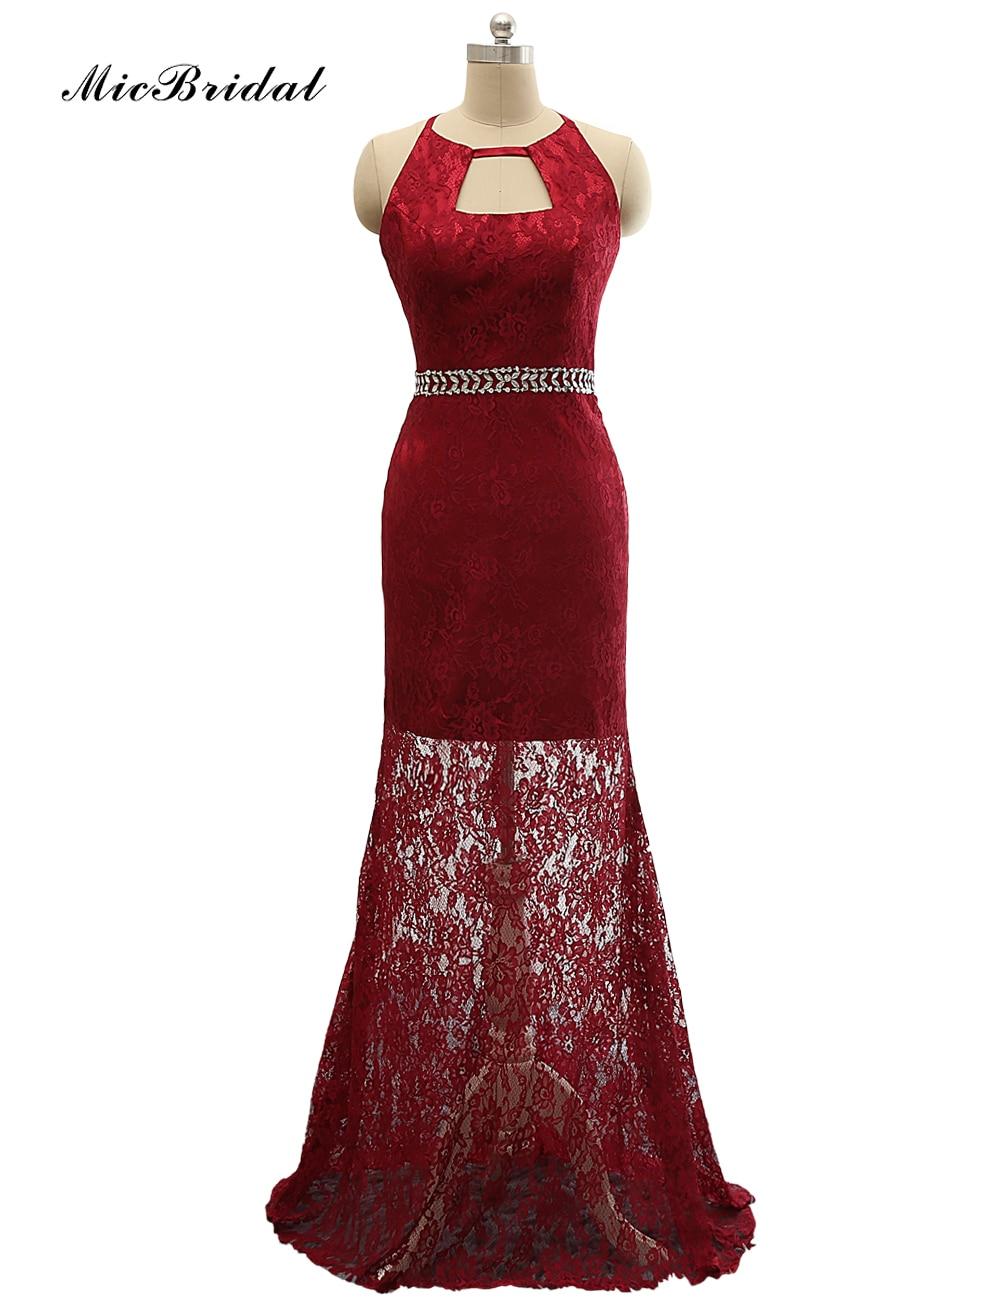 7f0fed666 bd5e4dce93d5948e46951e860a5152a1 vestidos baratos en burlington